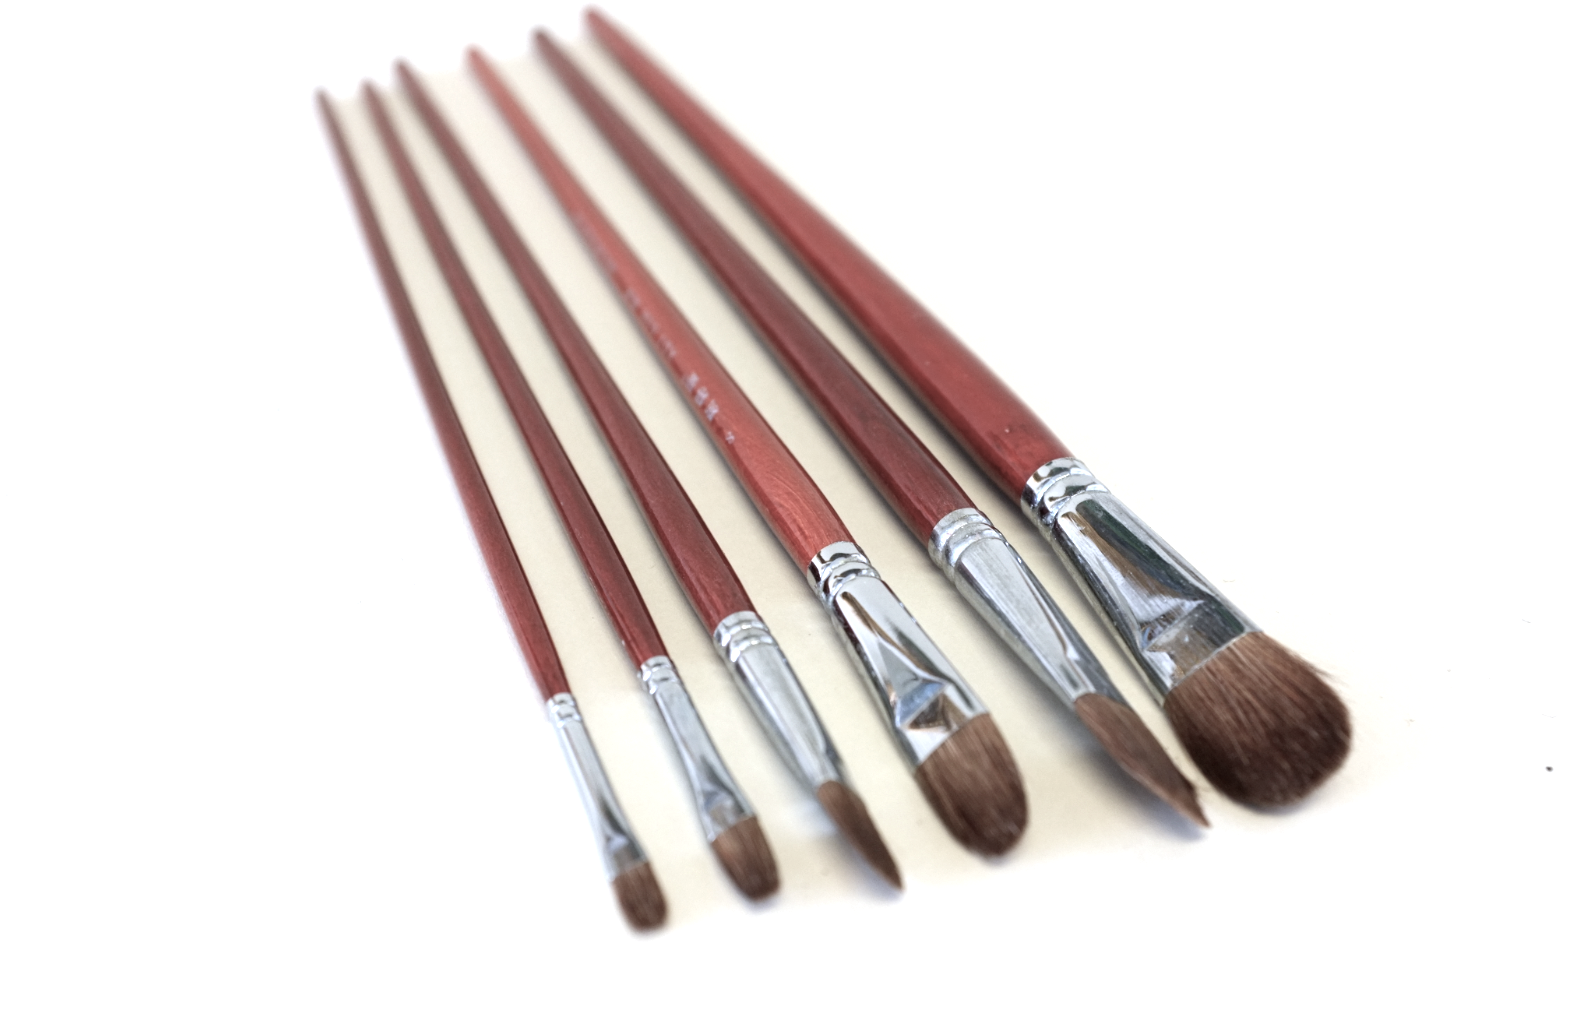 One Brush Painting Workshop